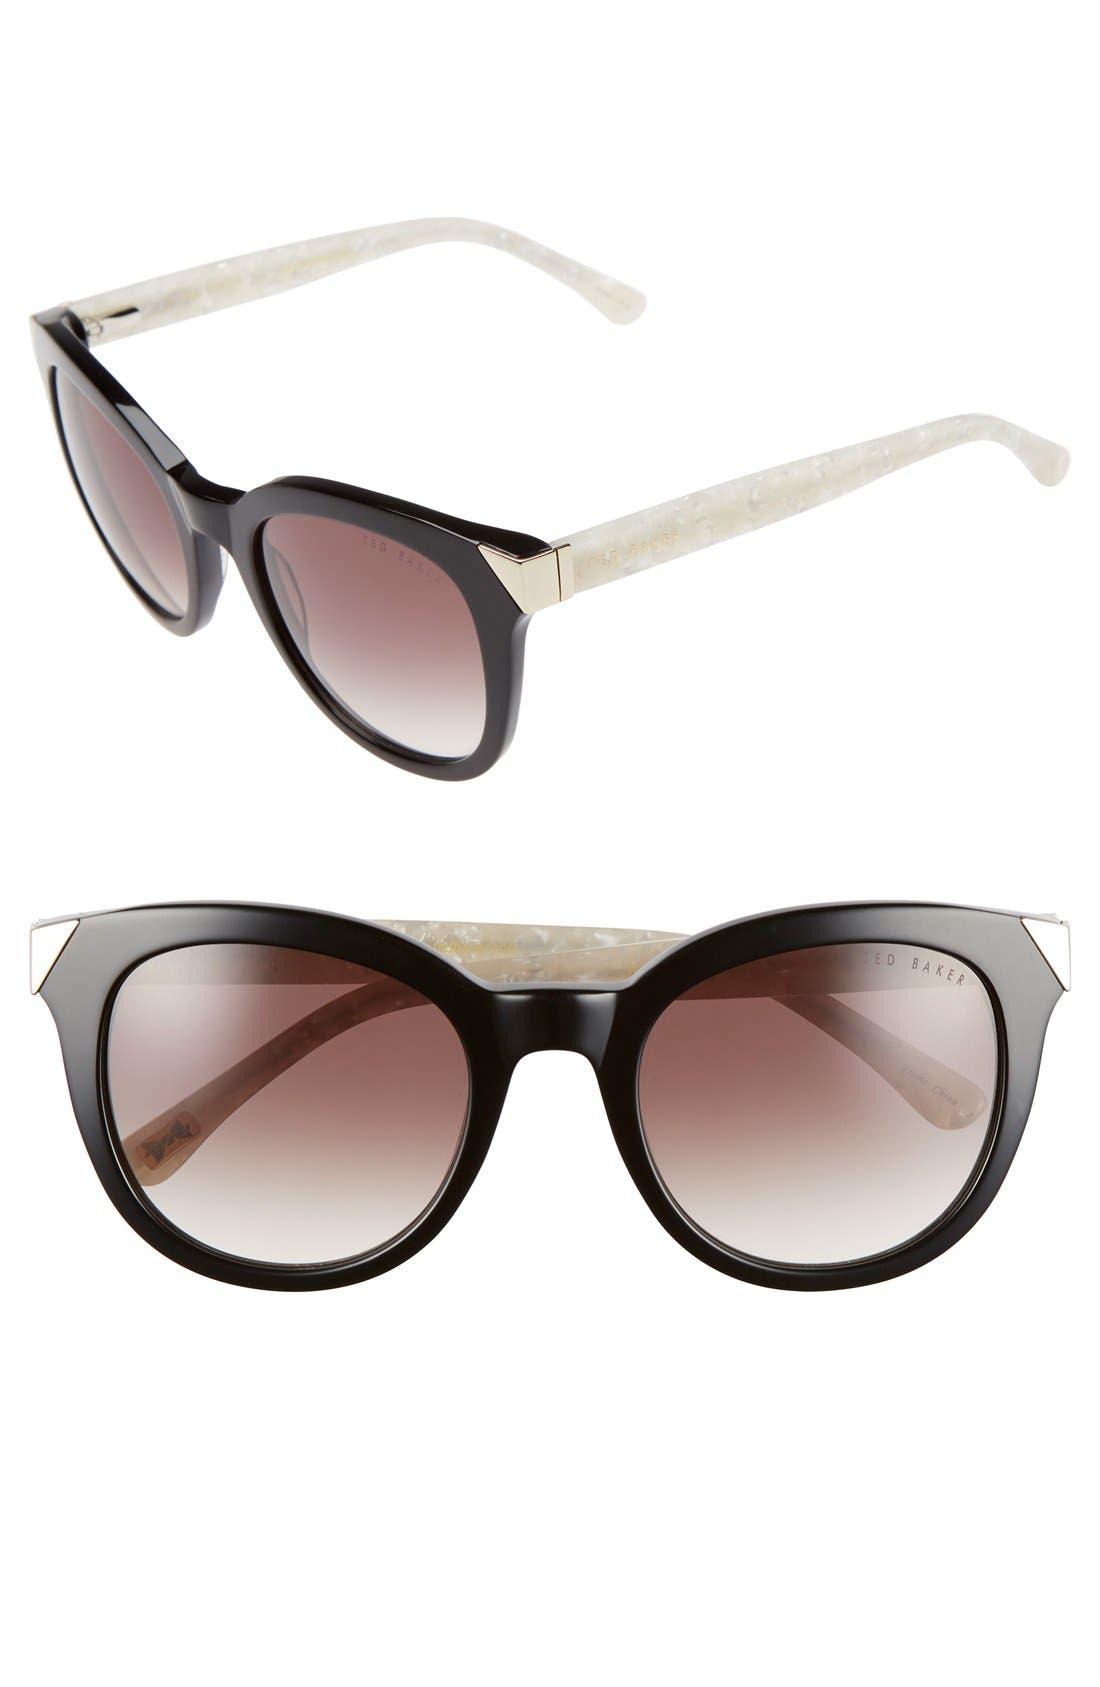 52mm Metal Accent Sunglasses,                         Main,                         color, Black